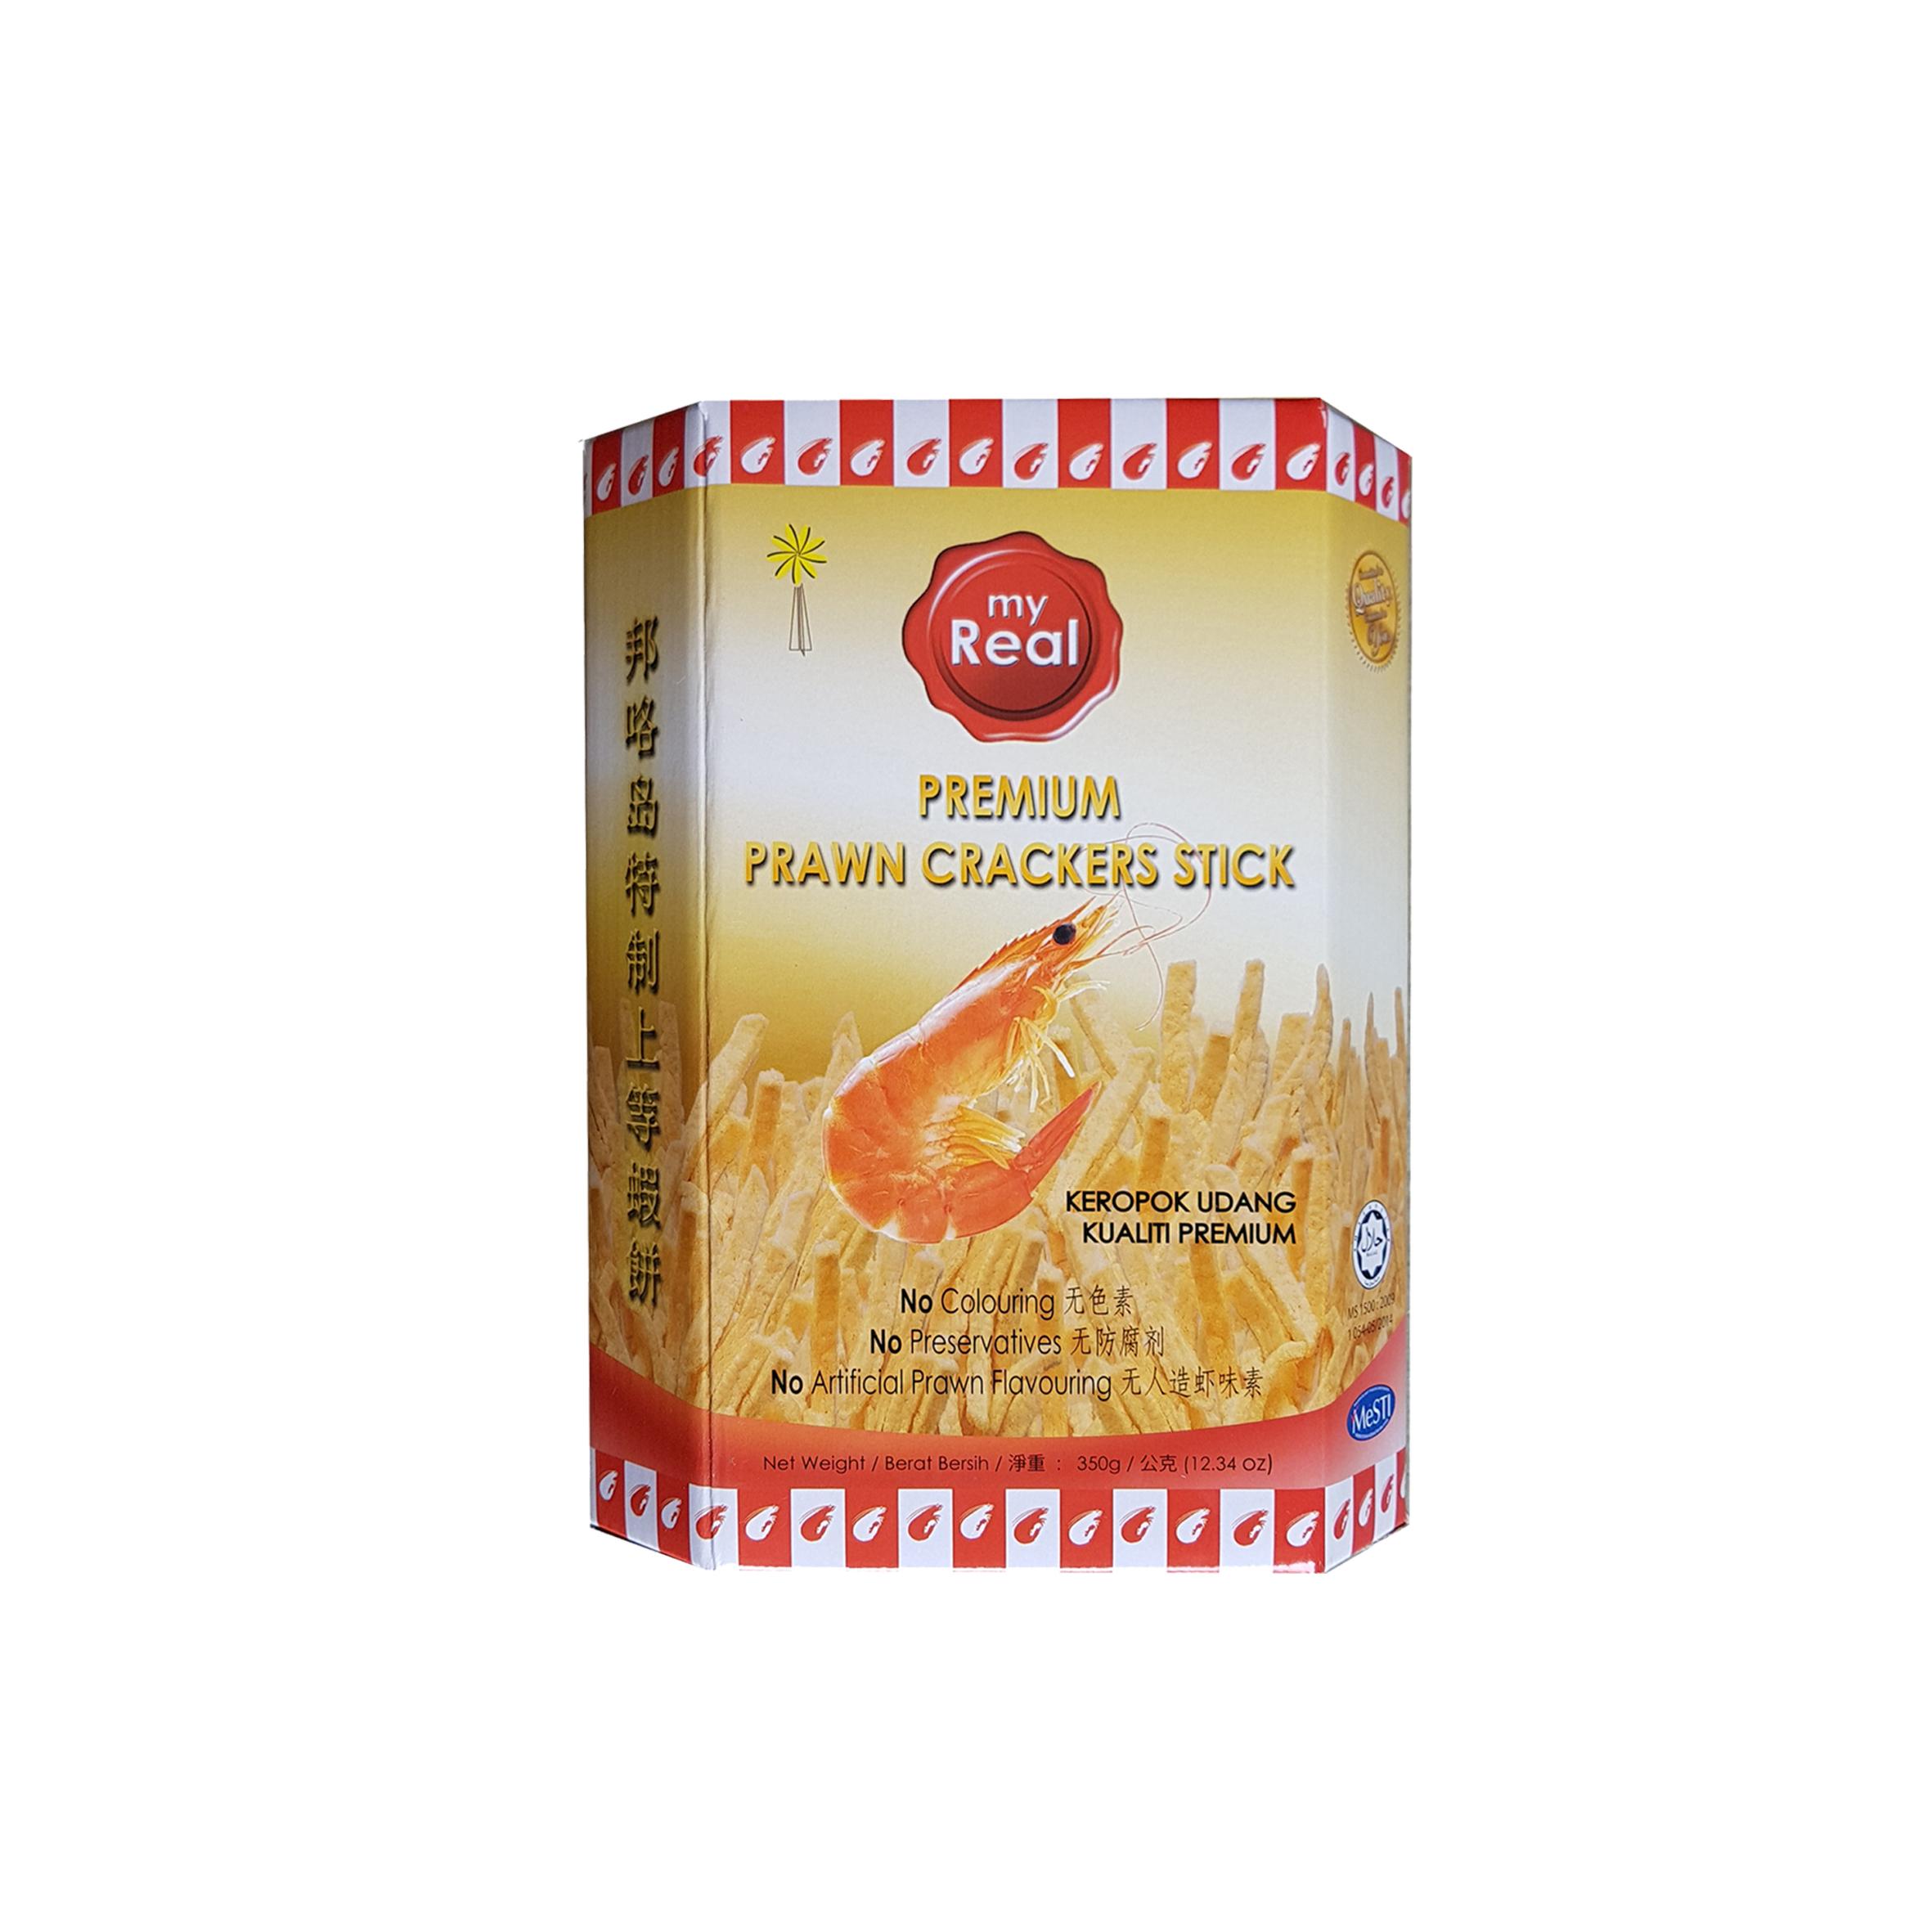 350g myReal Premium Prawn Crackers Stick